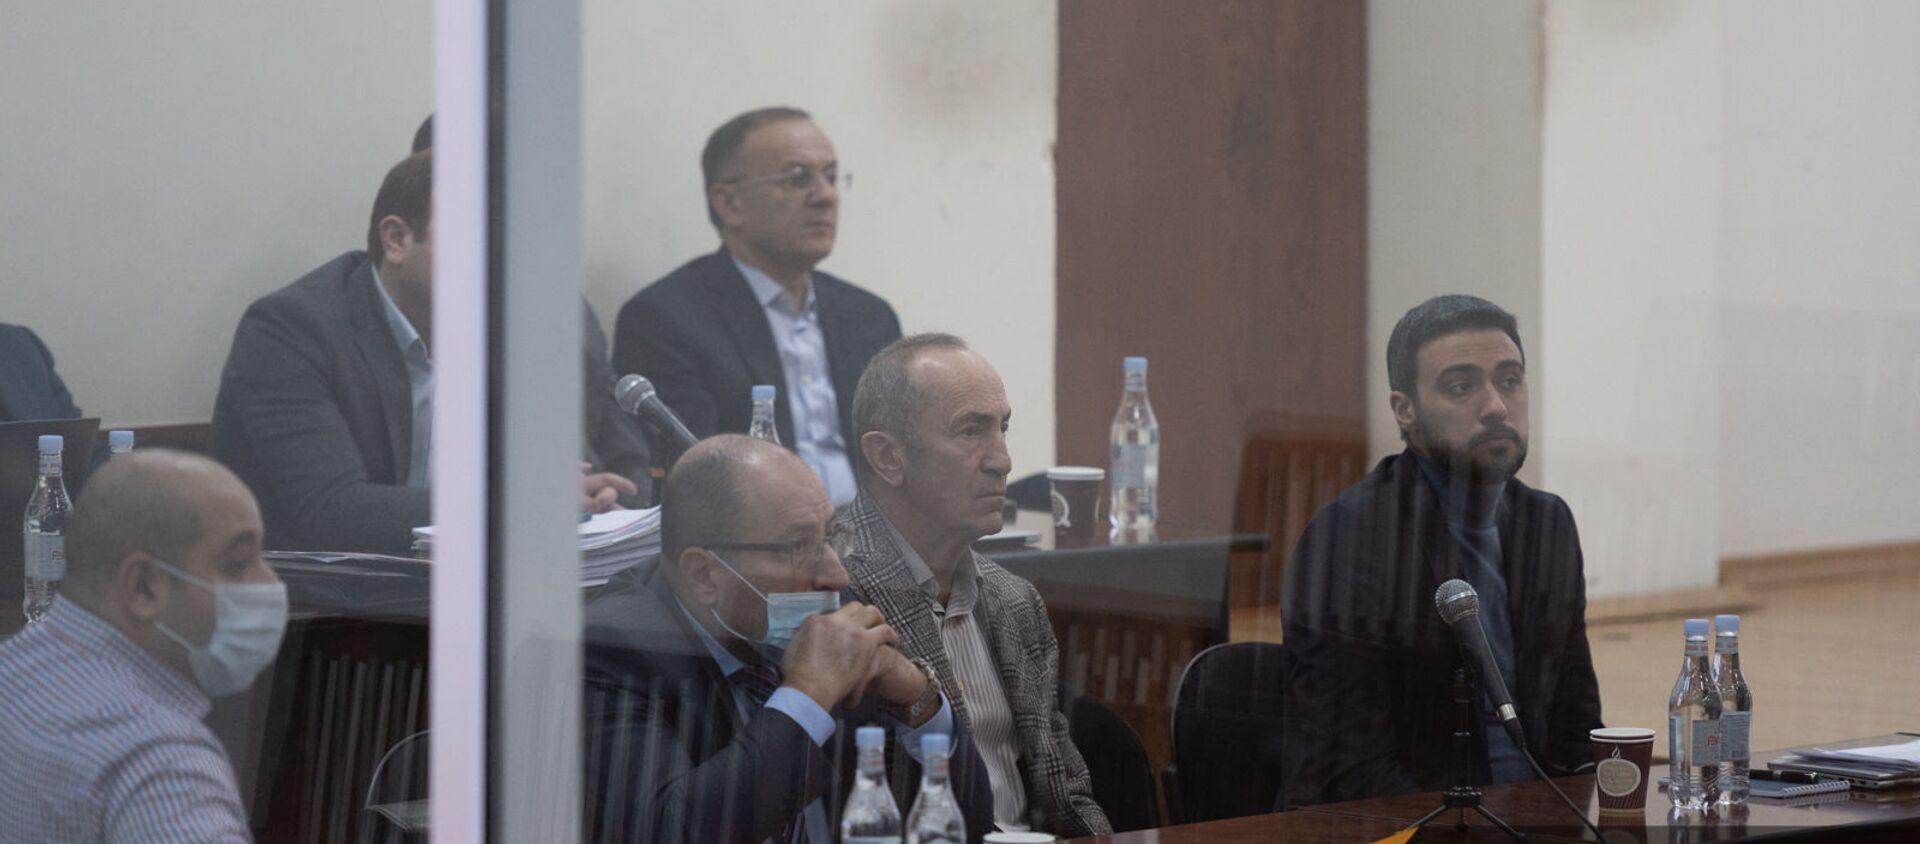 Роберт Кочарян в зале Шенгавитского суда (2 февраля 2021). Еревaн - Sputnik Արմենիա, 1920, 02.02.2021